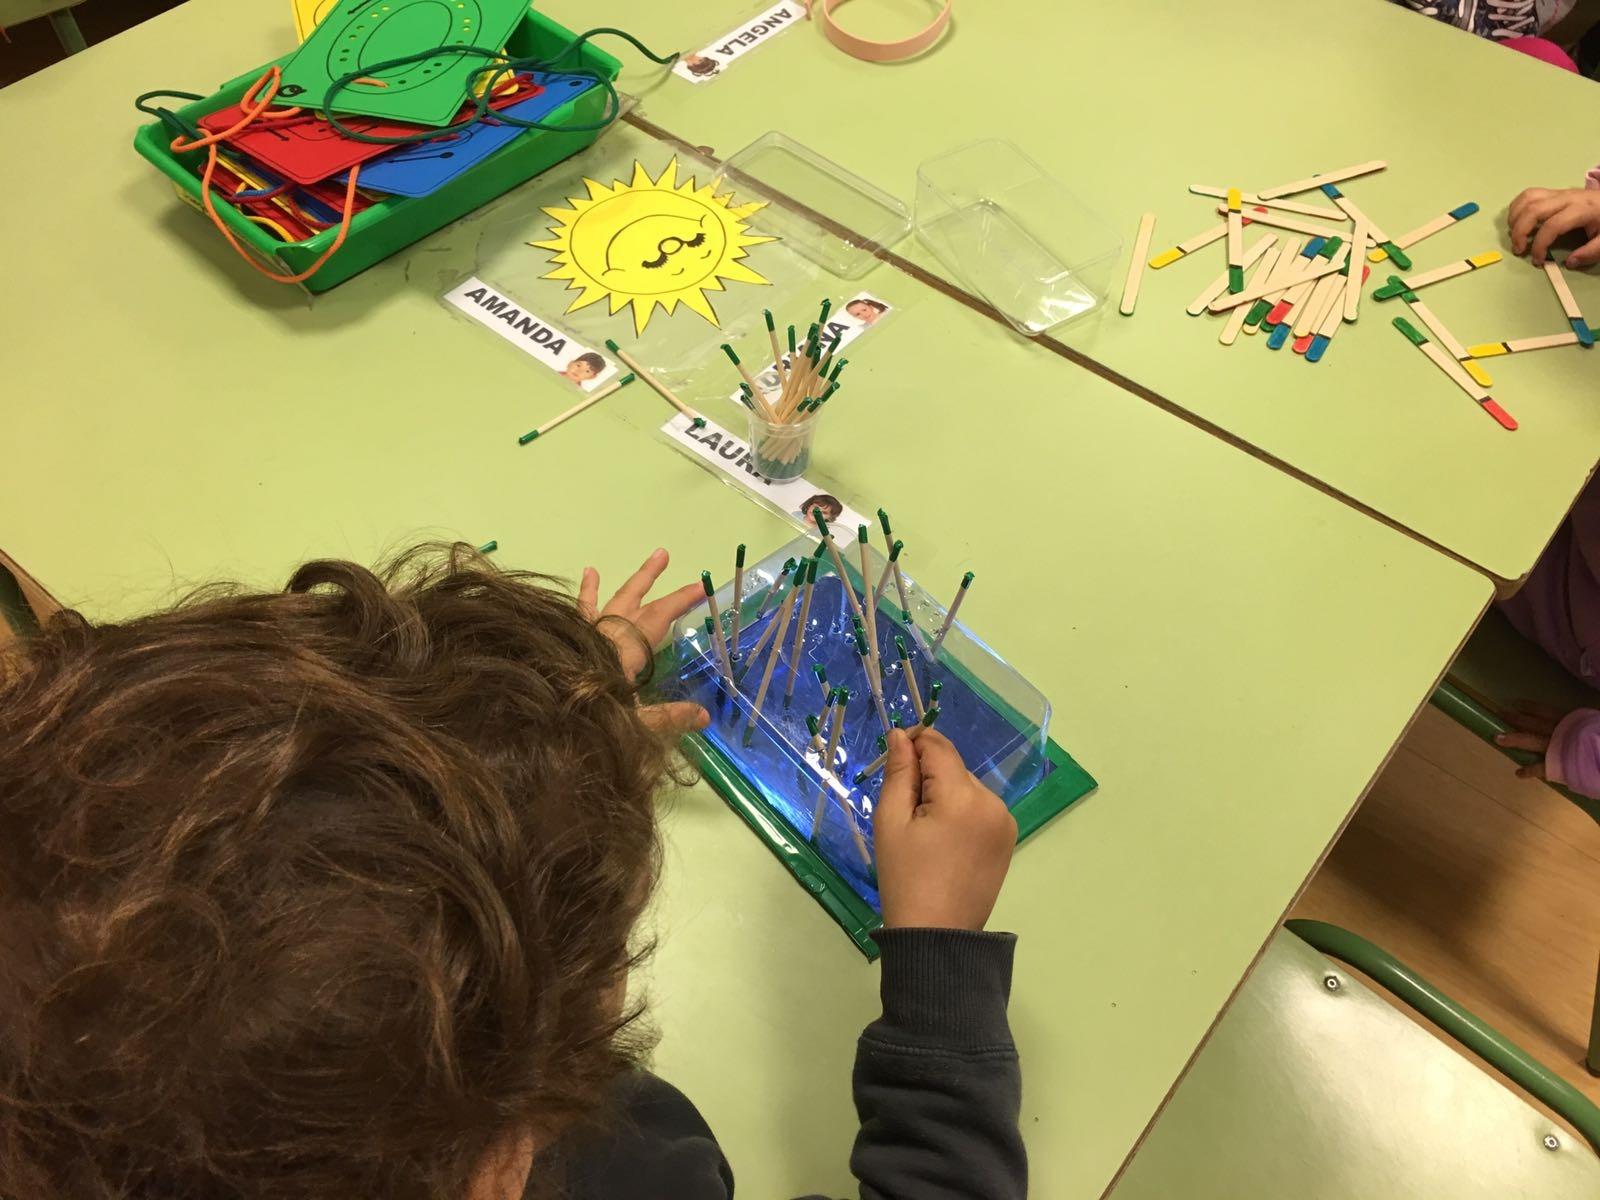 E. Infantil y sus proyectos 11